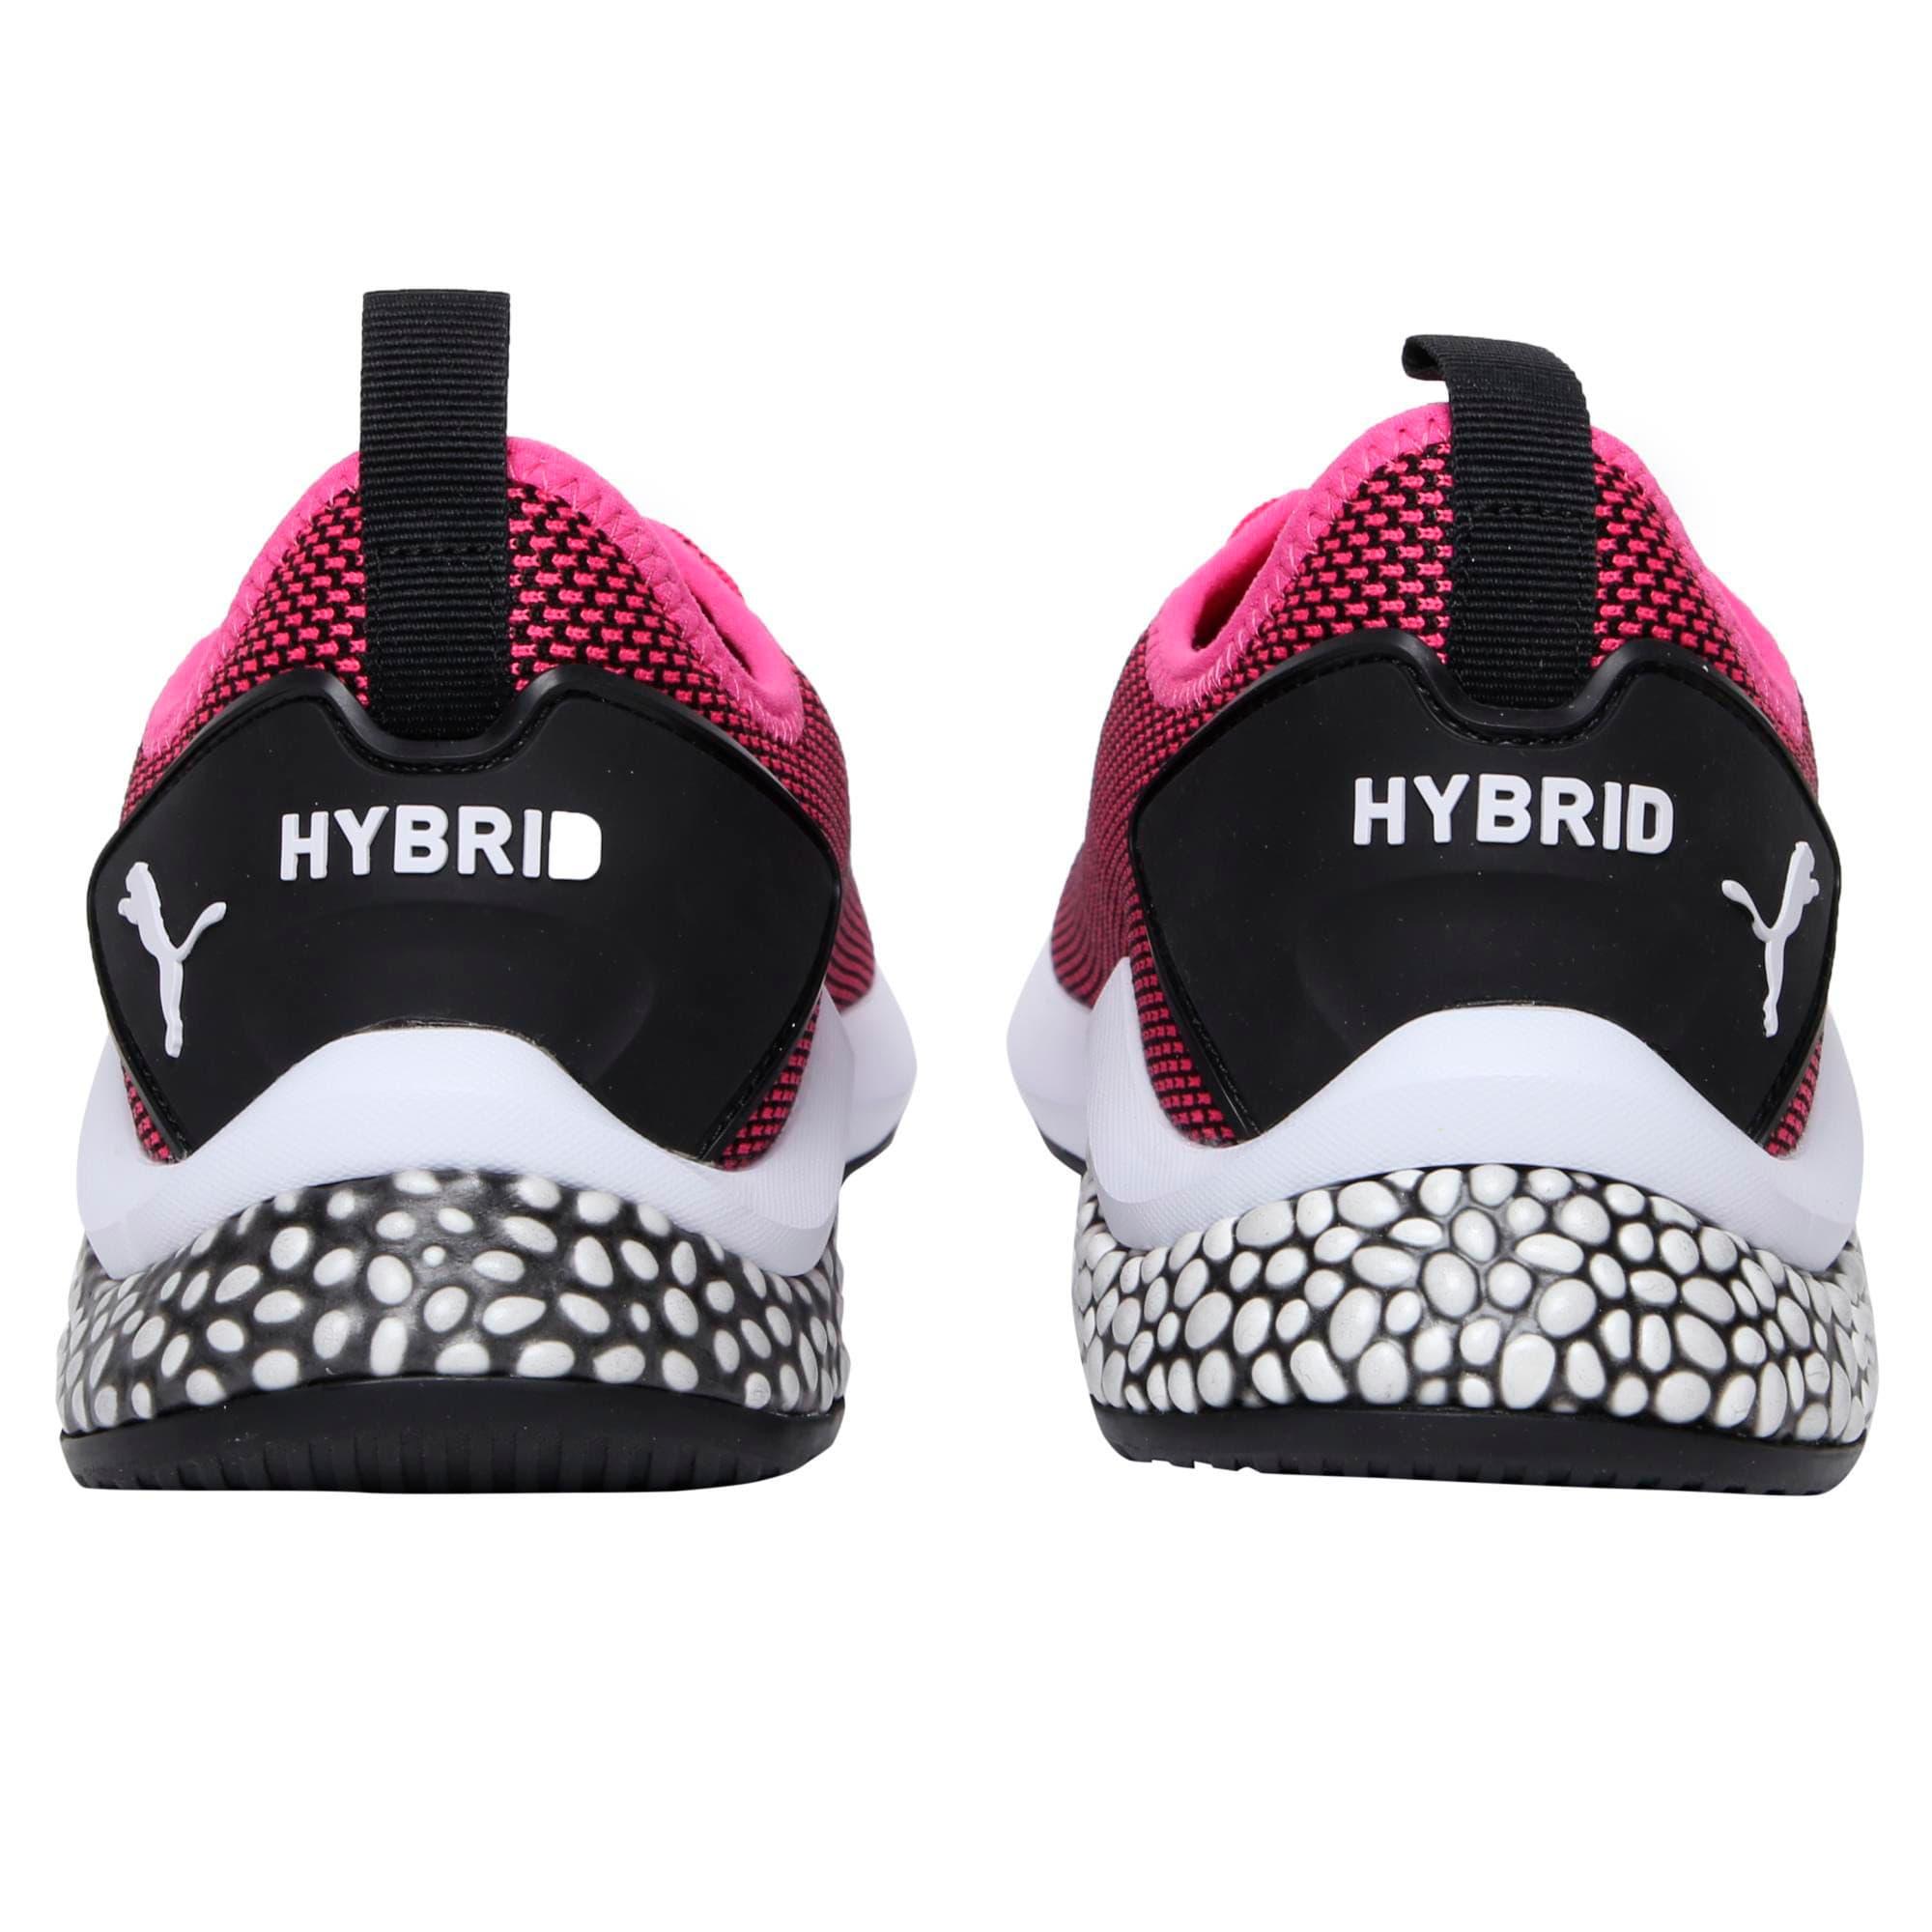 Thumbnail 3 of HYBRID NX Youth Trainers, Fuchsia Purple-White-Black, medium-IND